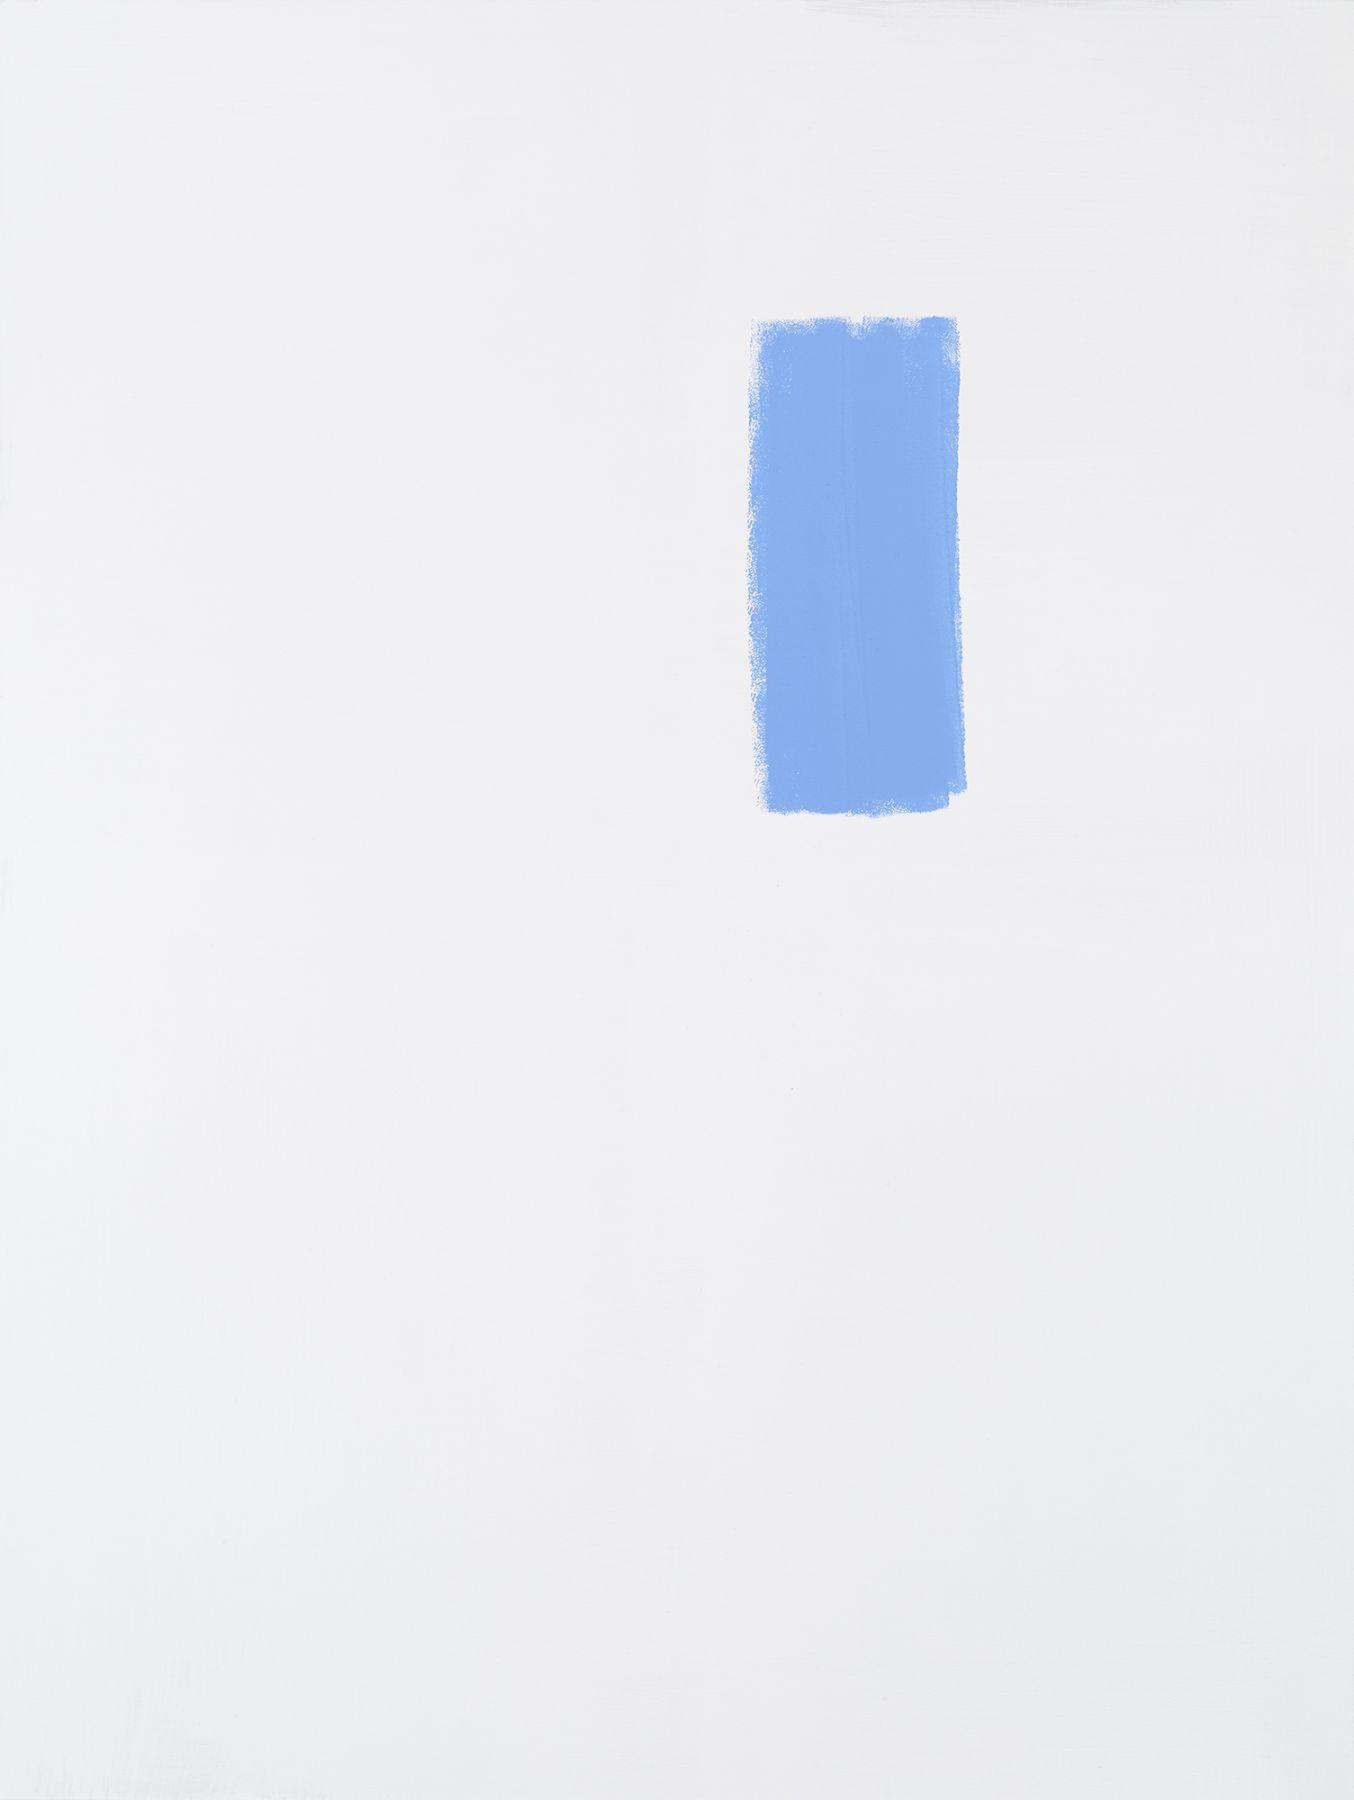 Michael Krebber MK.307, 2015 Acrylic on canvas 78 3/4 x 59 1/8 inches (200 x 150.2 cm)